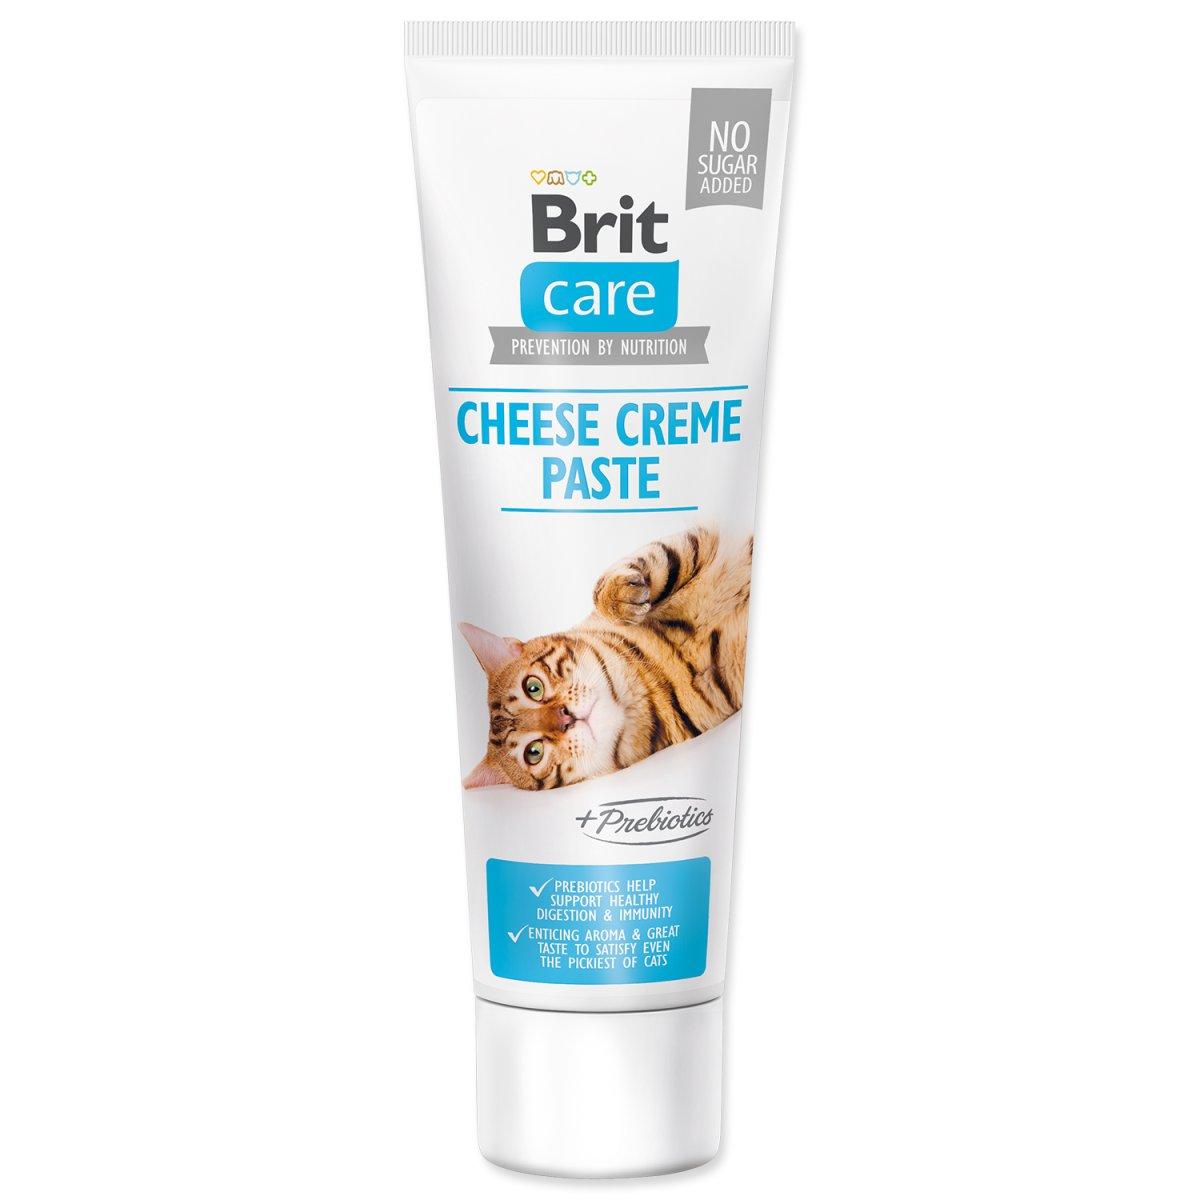 BRIT Care Cat Paste Cheese Creme enriched with Prebiotics (100g)